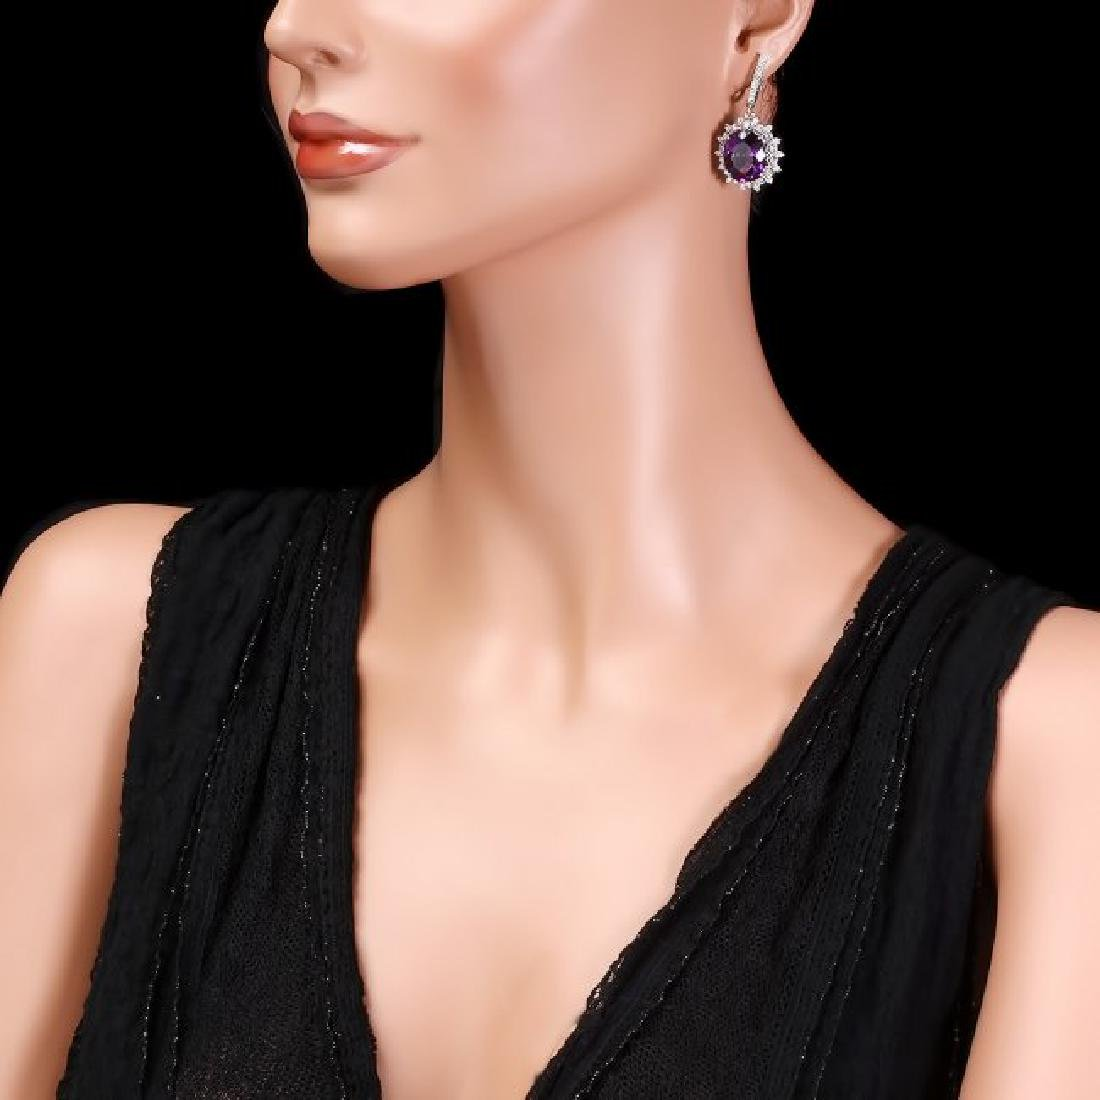 14k Gold 15.00ct Amethyst 2.00ct Diamond Earrings - 3